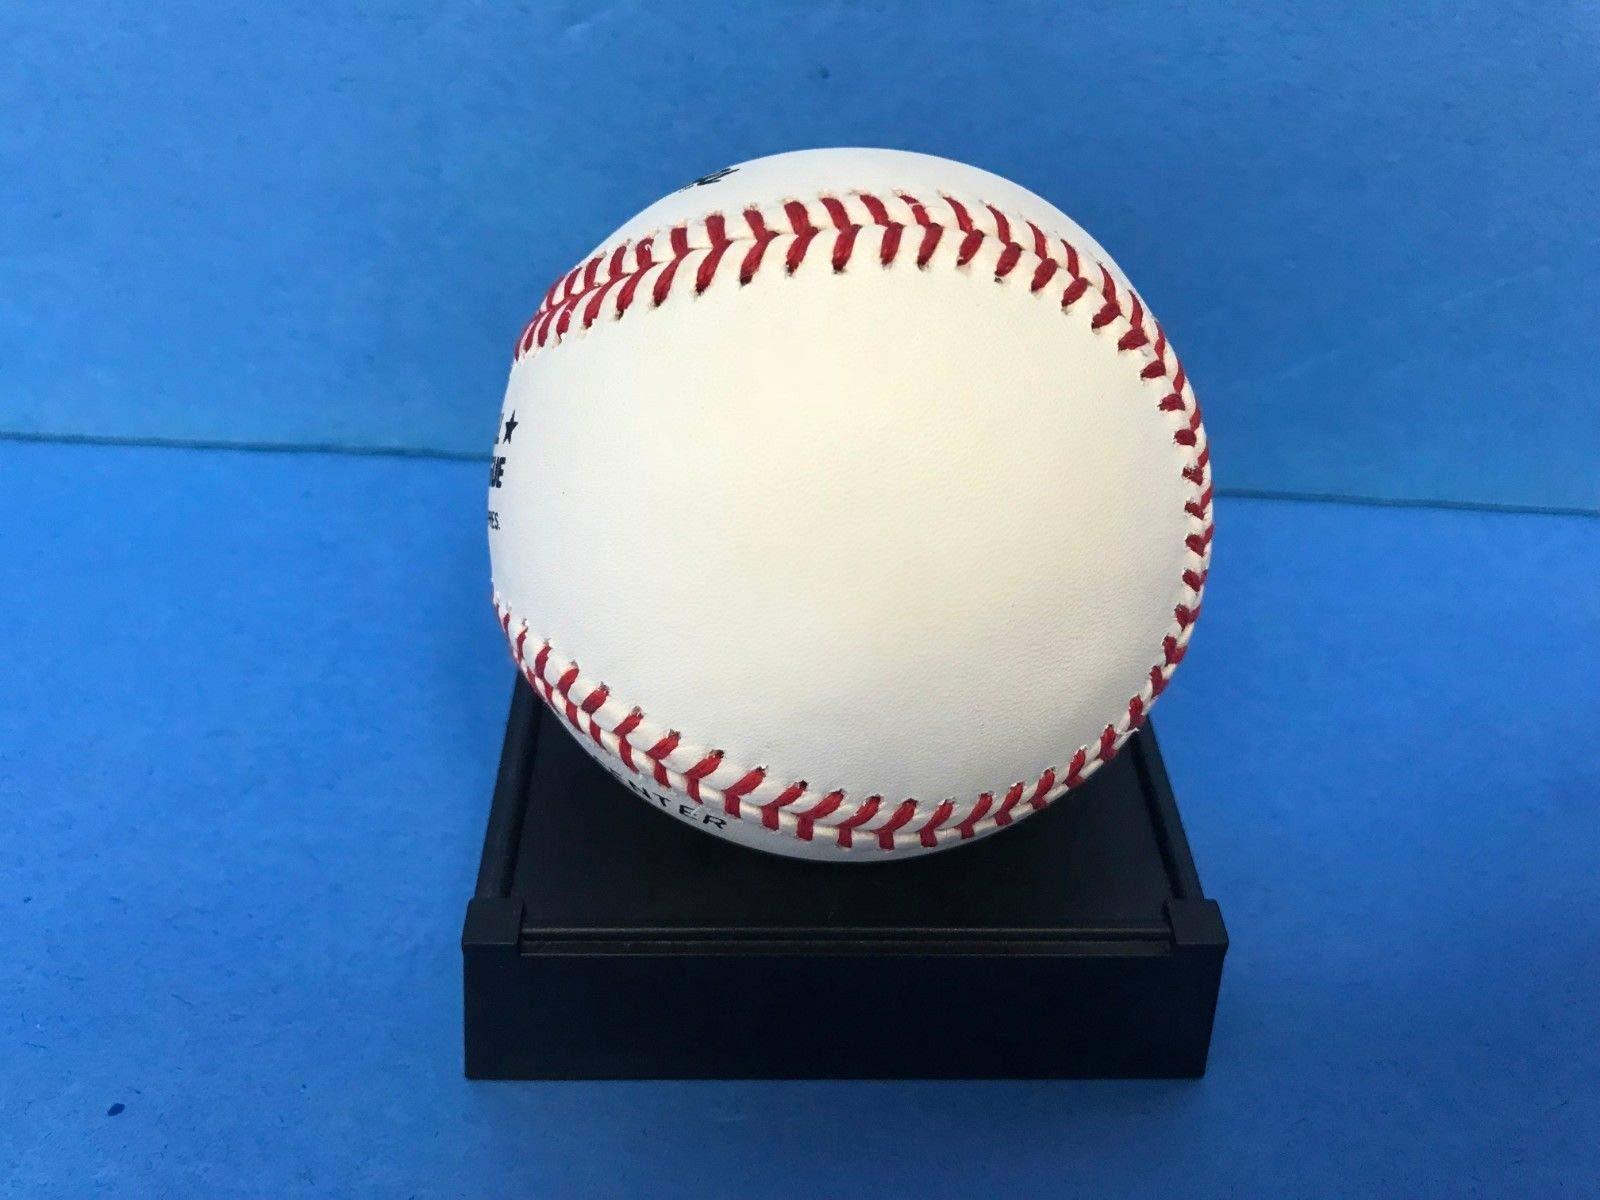 Benito Santiago San Diego Padres Fan Favorite Signed Autograph Baseball